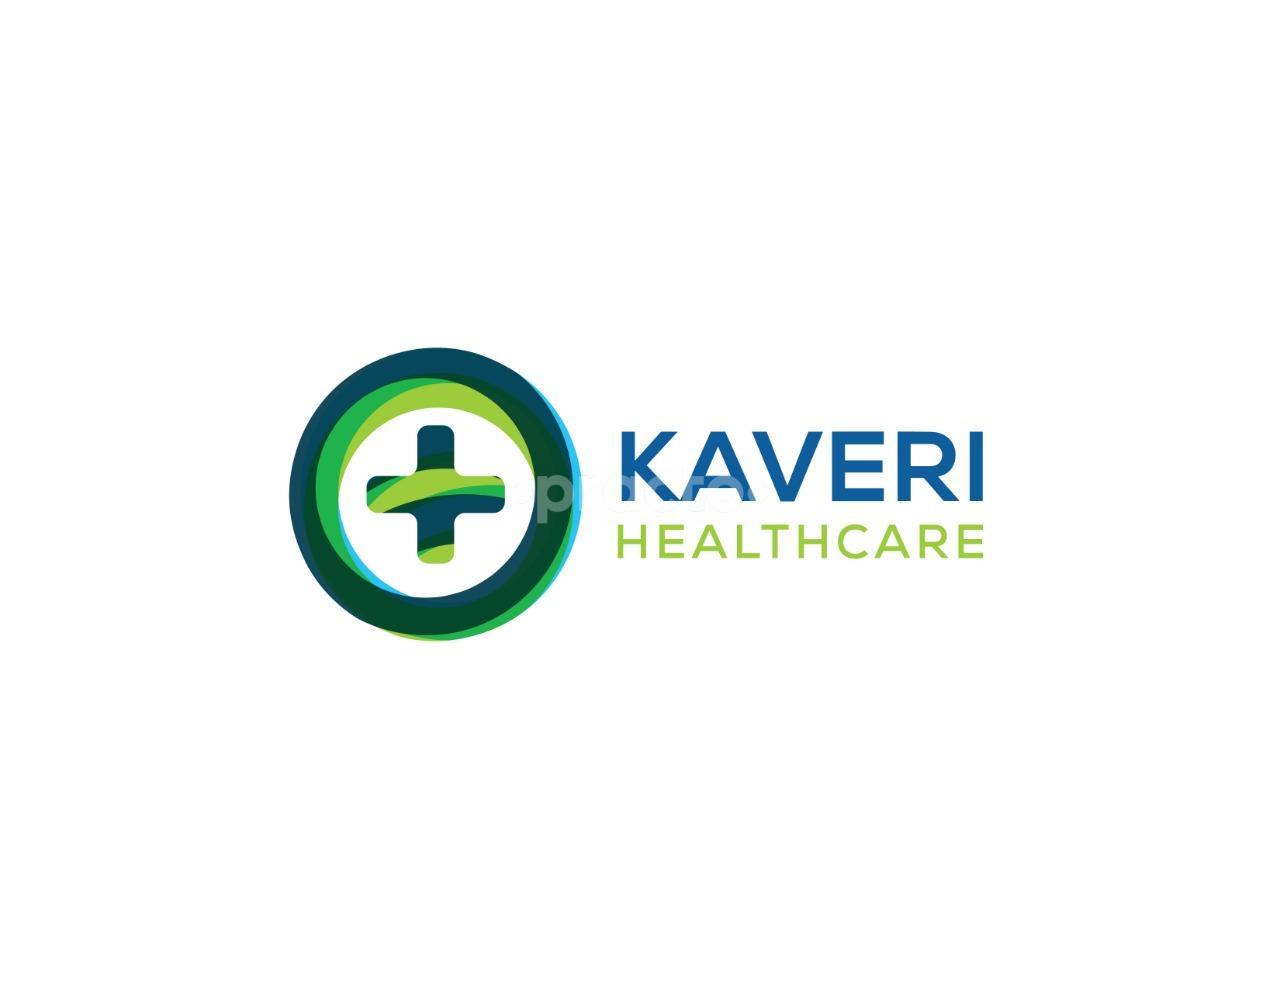 KAVERI HEALTHCARE